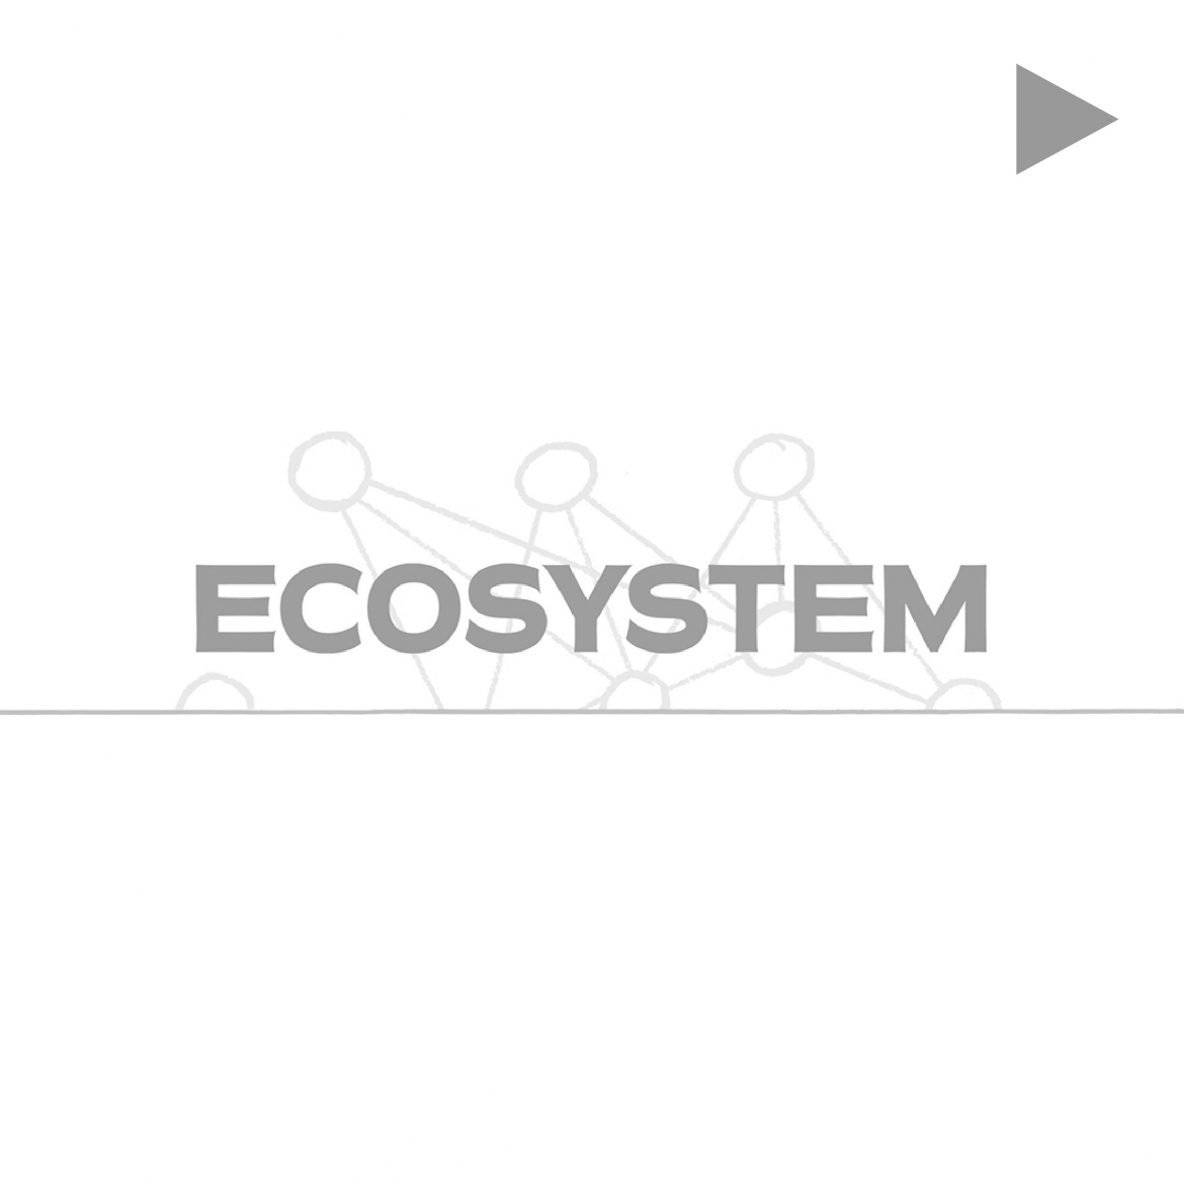 Danger Ecosystem